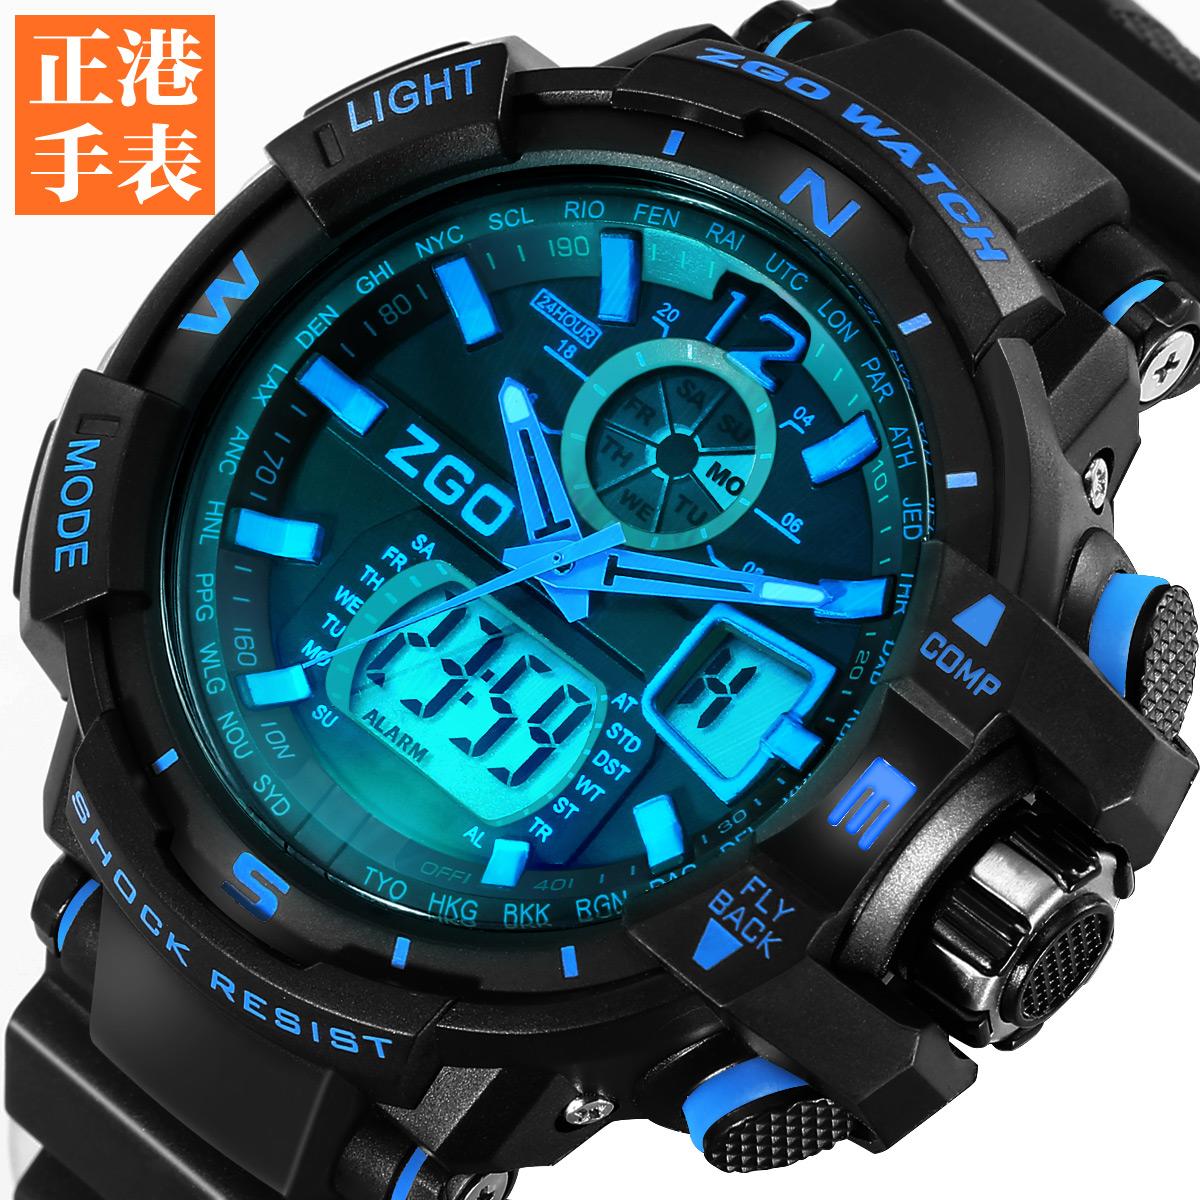 2015 New Fashion Men Glow Led Watches Men's Quartz Hour Clock Analog Digital LED Watch Sports Military Wrist Watch 99 g + box(China (Mainland))